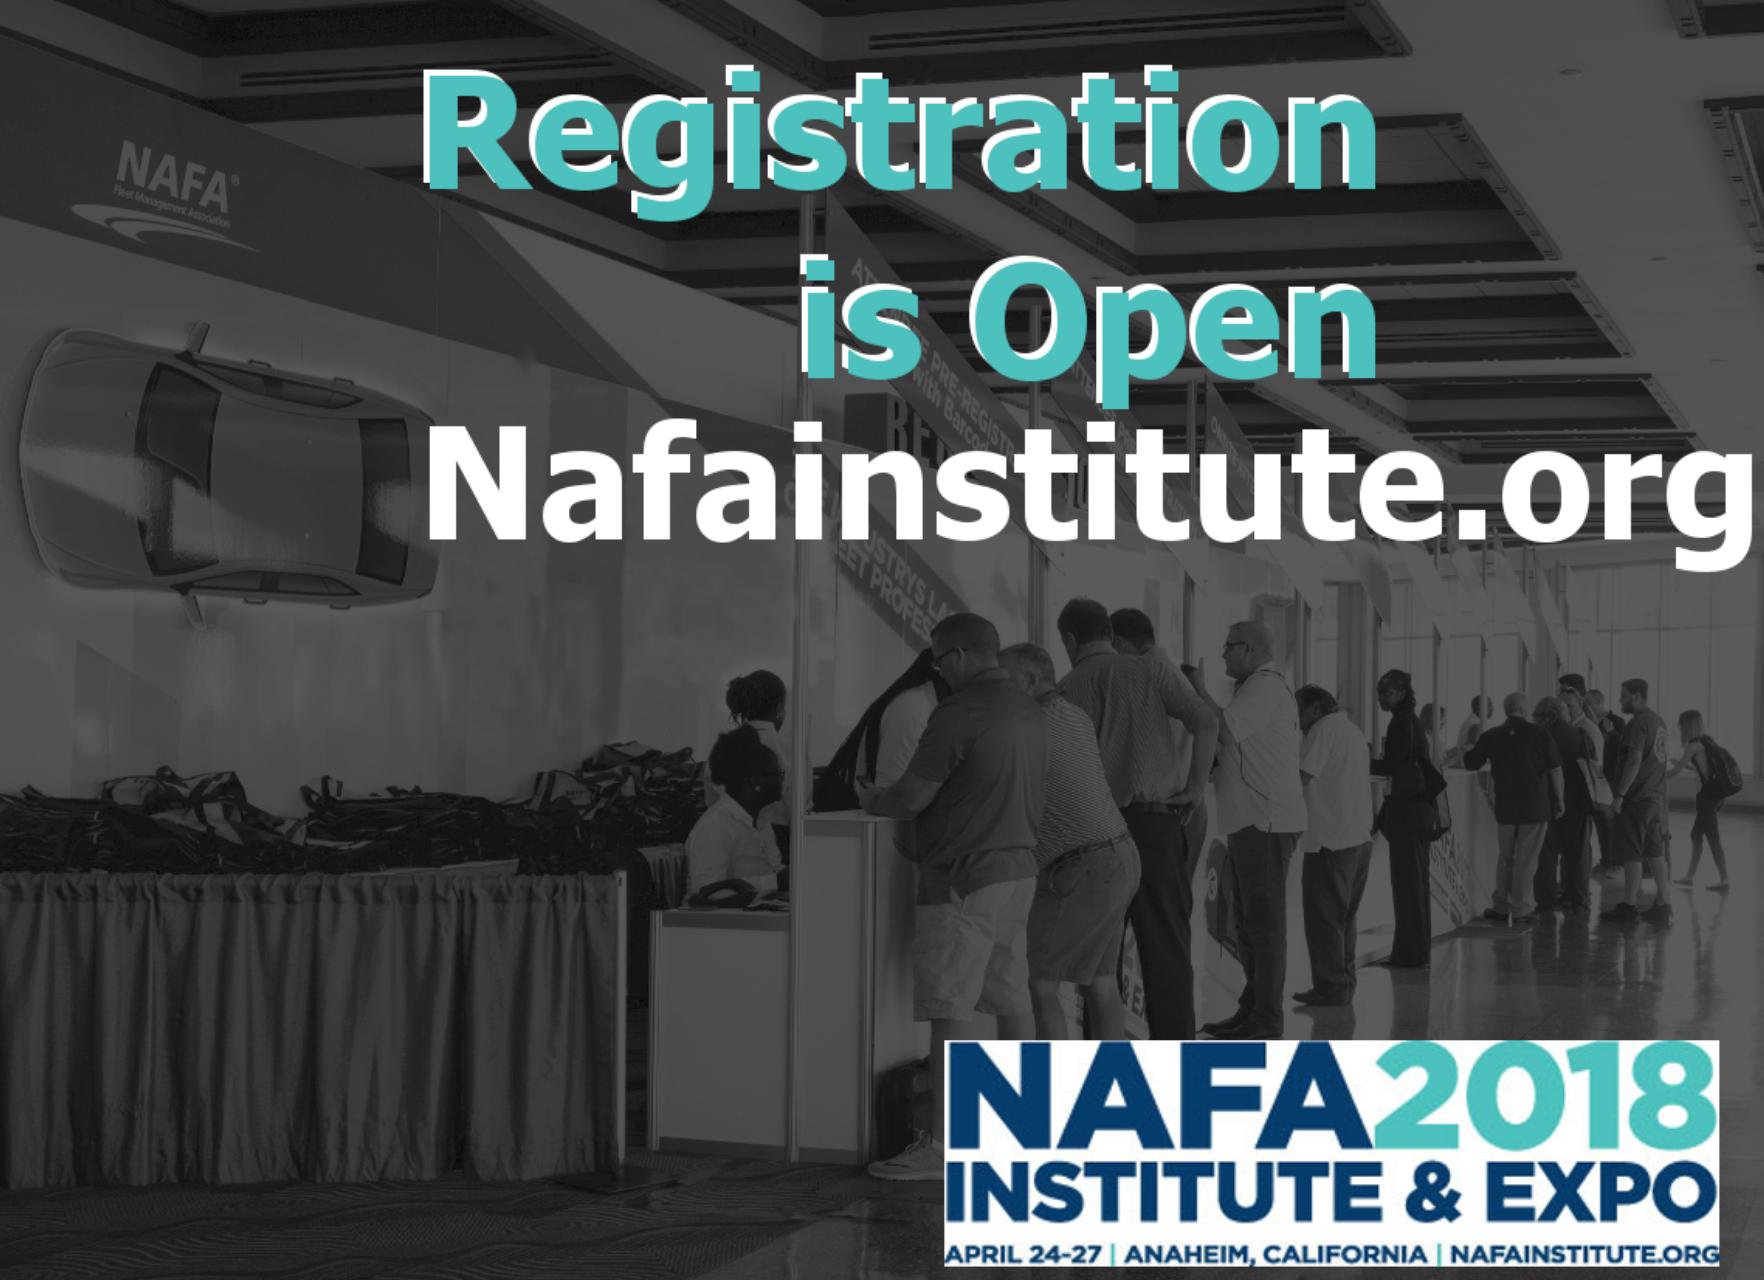 NAFA Opens Registration for 2018 Institute & Expo